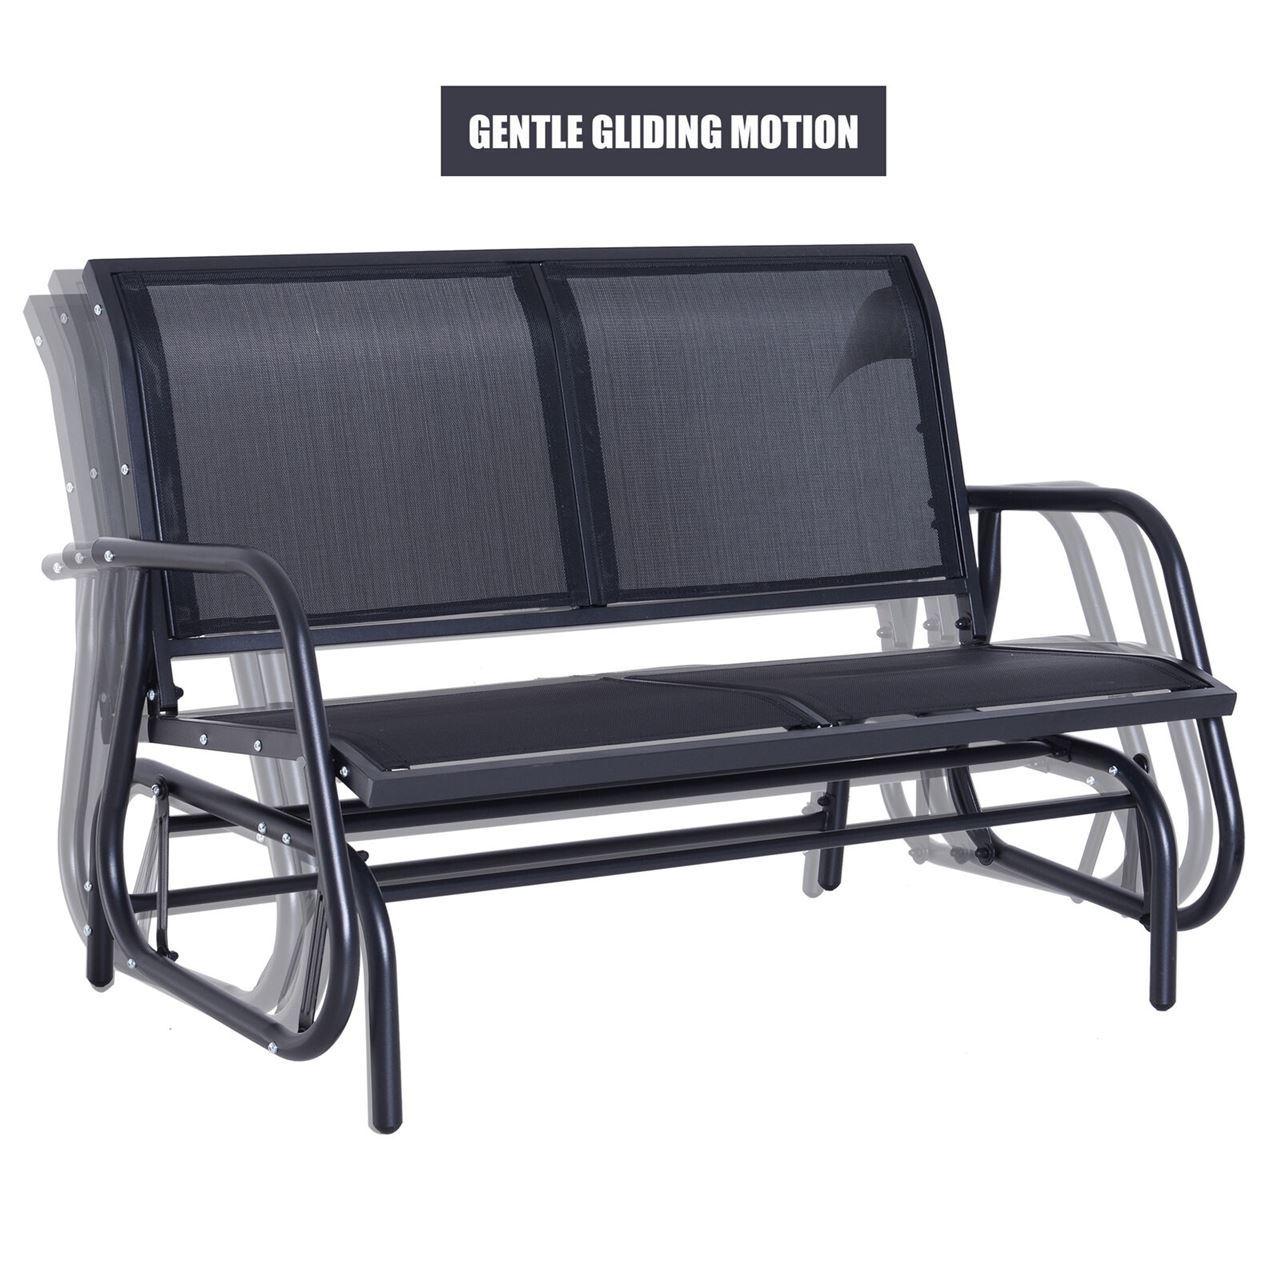 Outdoor Patio Swing Glider Bench Chair – Dark Gray Throughout Outdoor Patio Swing Glider Benches (View 11 of 25)